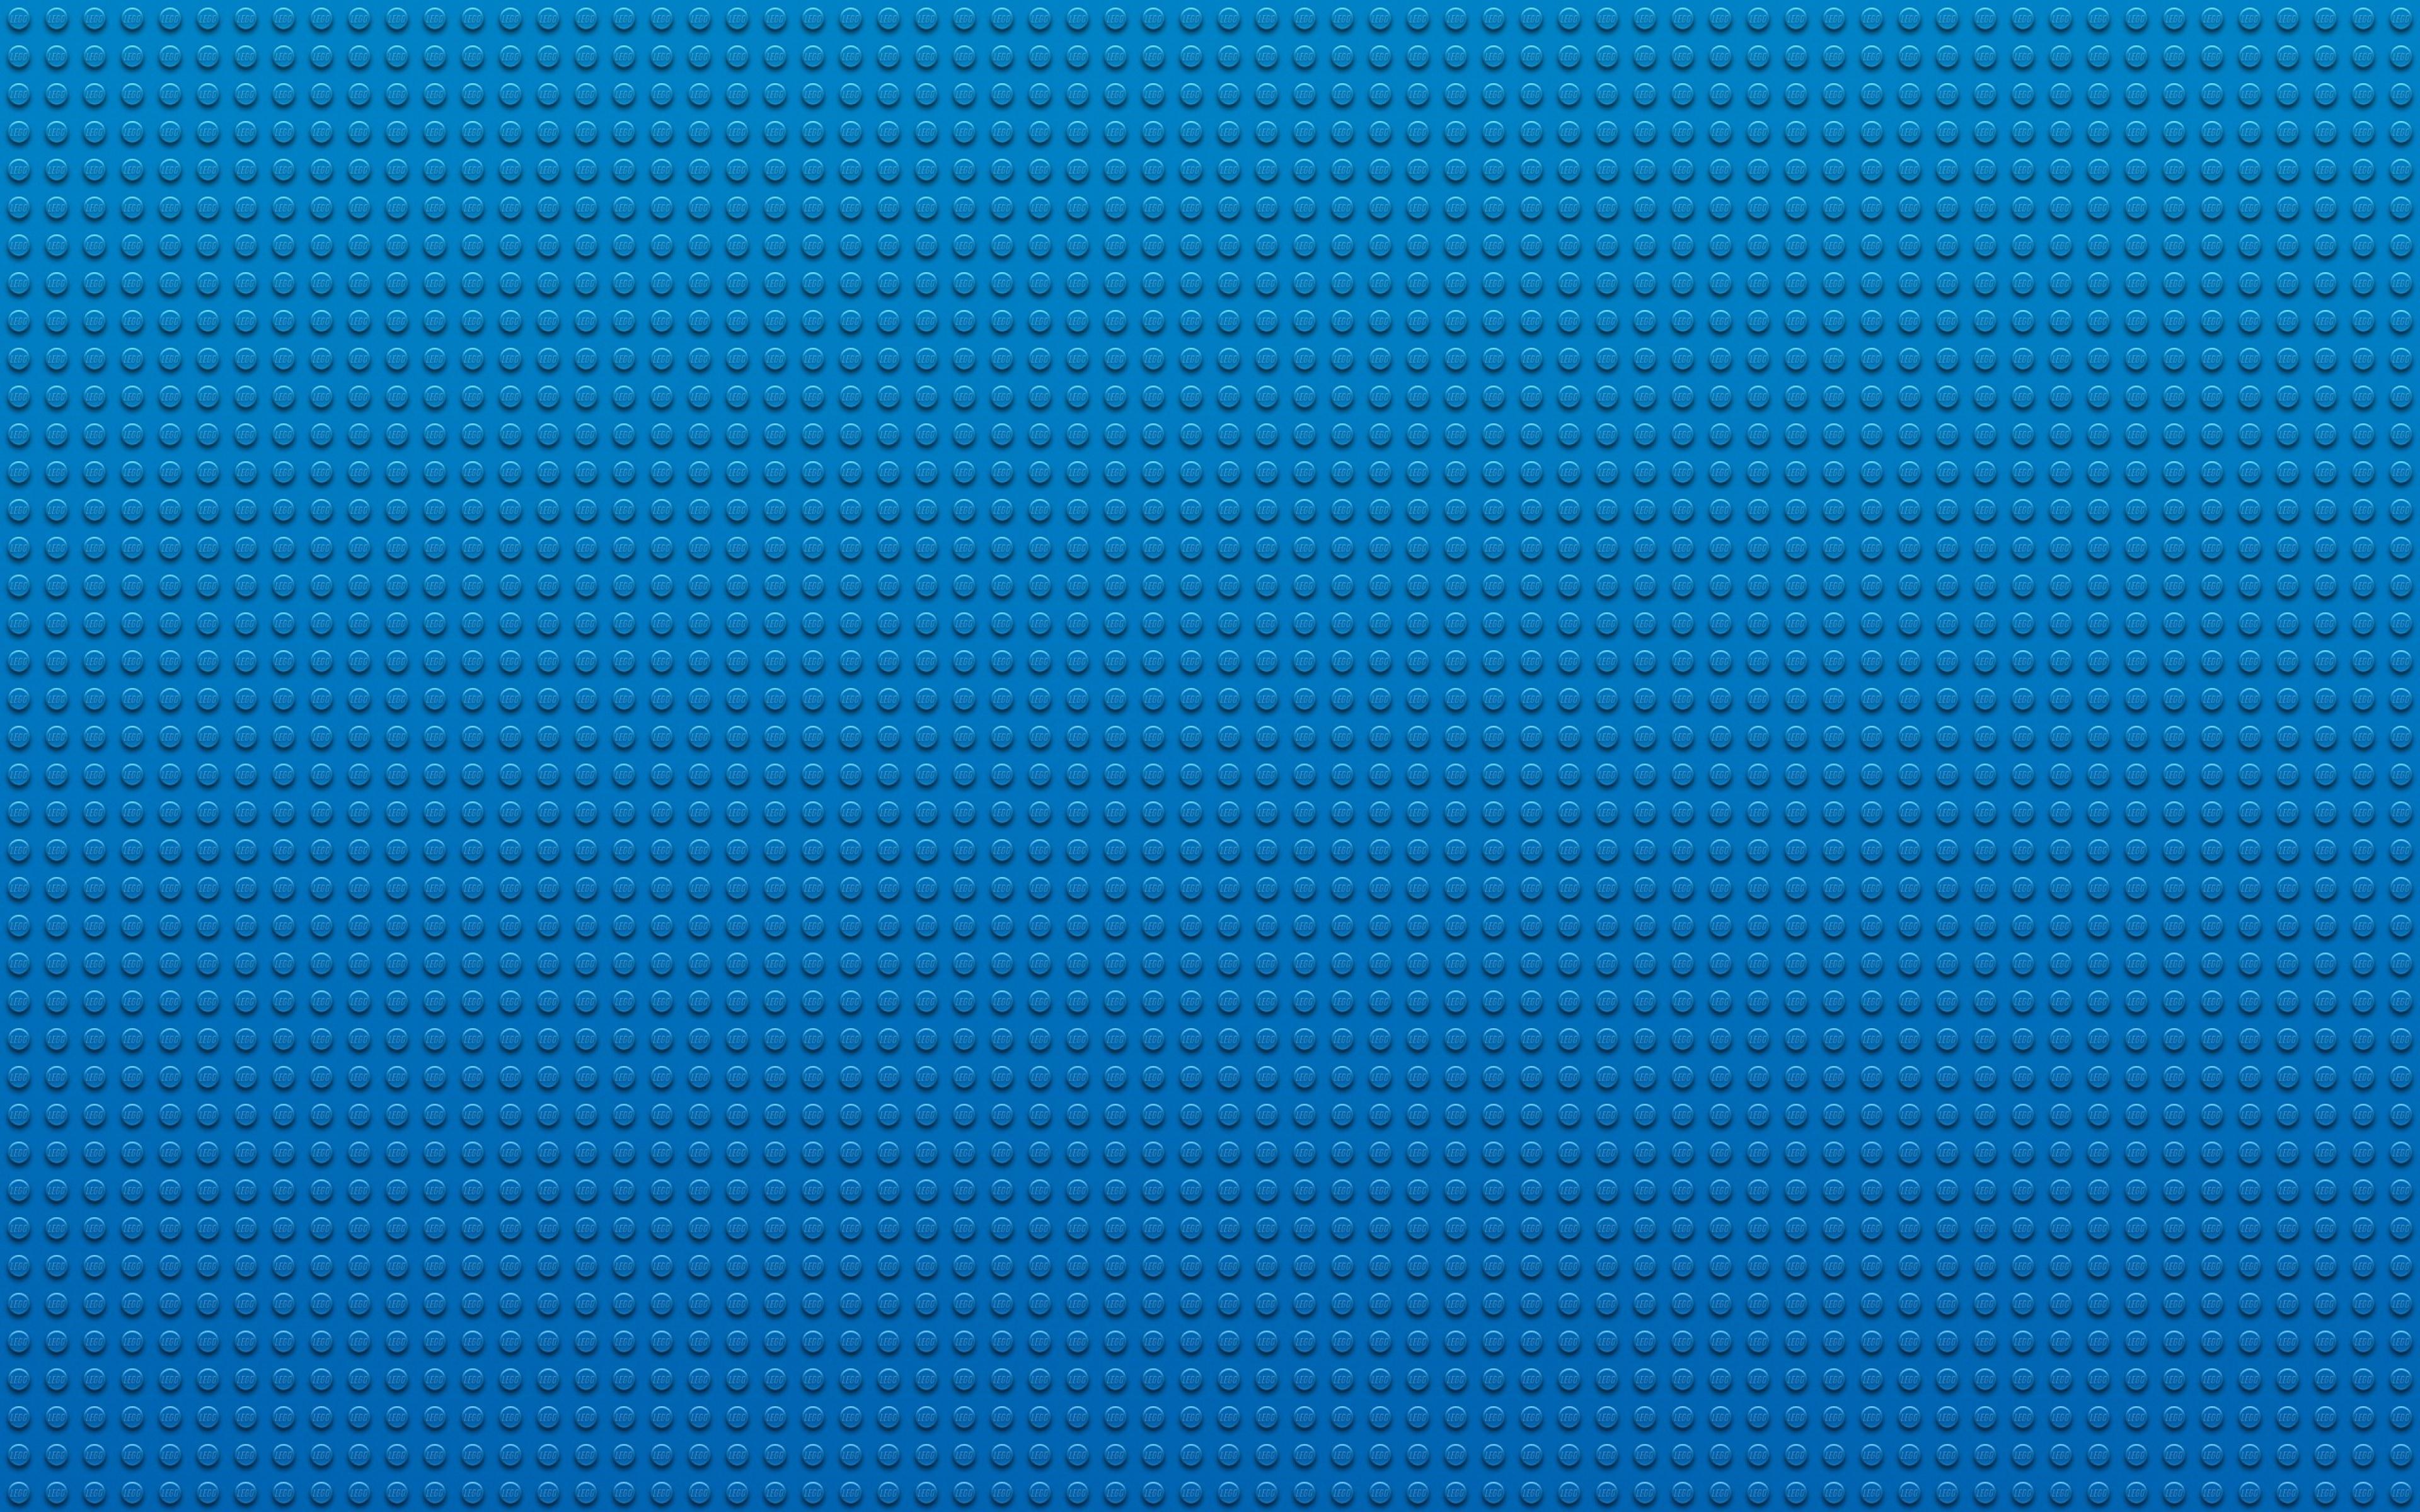 Thanksgiving Wallpaper Hd Lego Backgrounds Free Desktop Pixelstalk Net